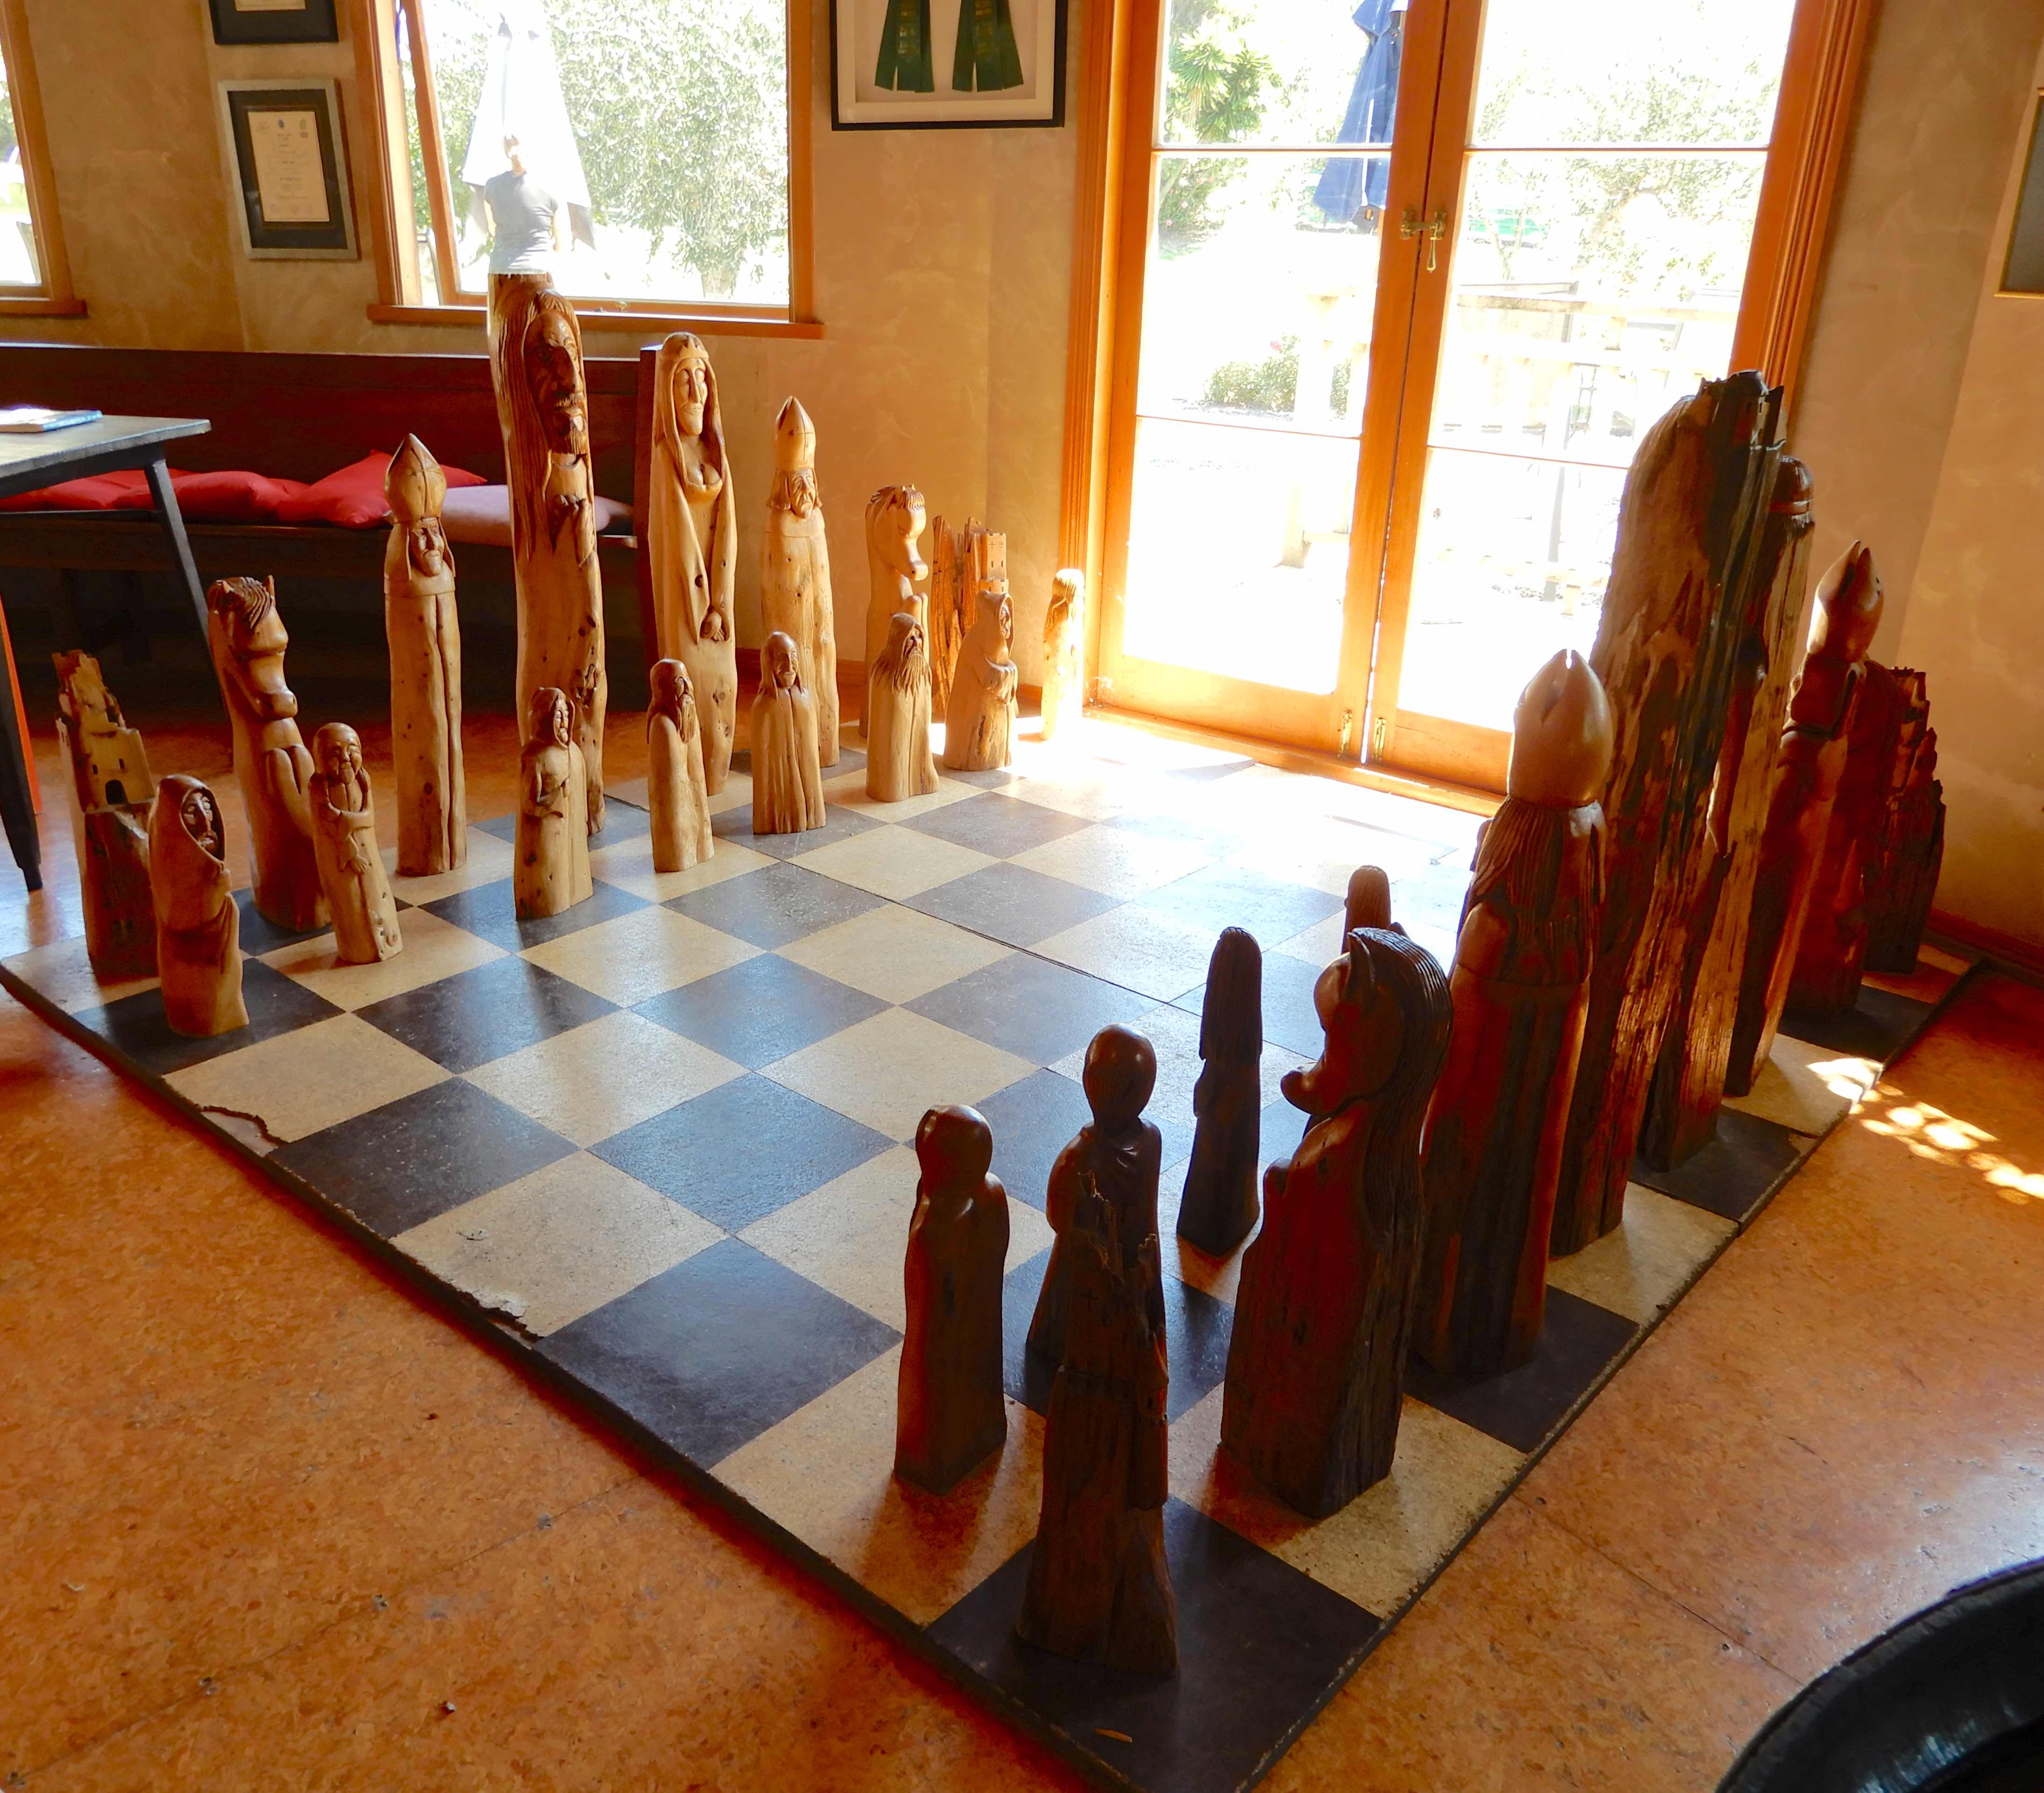 11.Rangihoua chess set